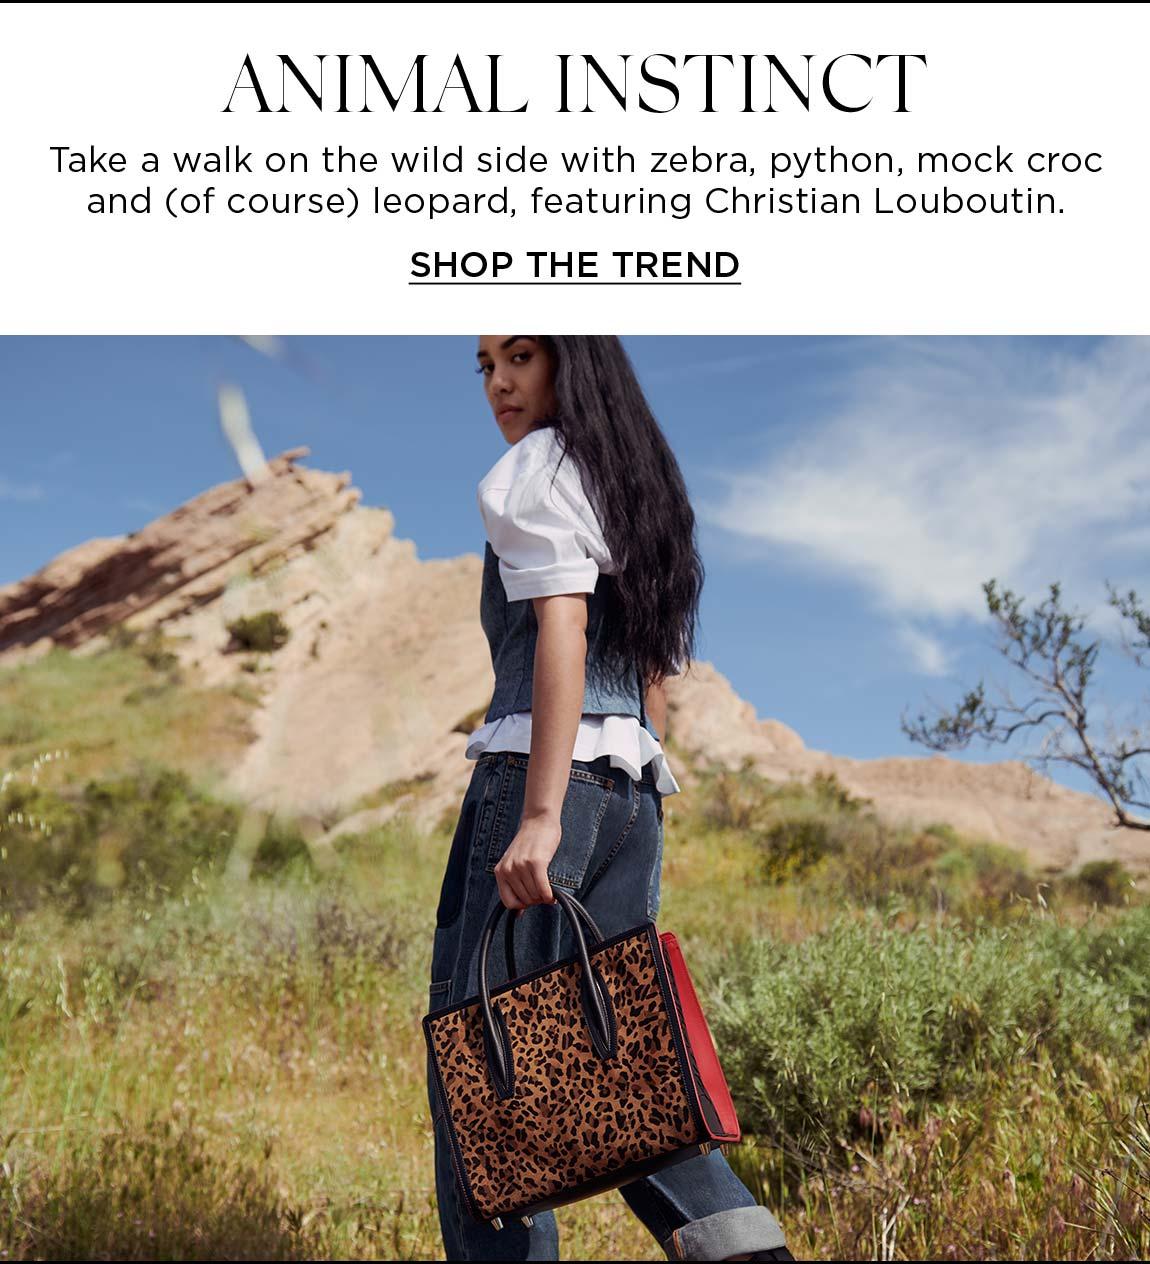 6288fbd9d Prada, Jimmy Choo, Gucci, Lanvin, Dolce & Gabbana   Bergdorf Goodman